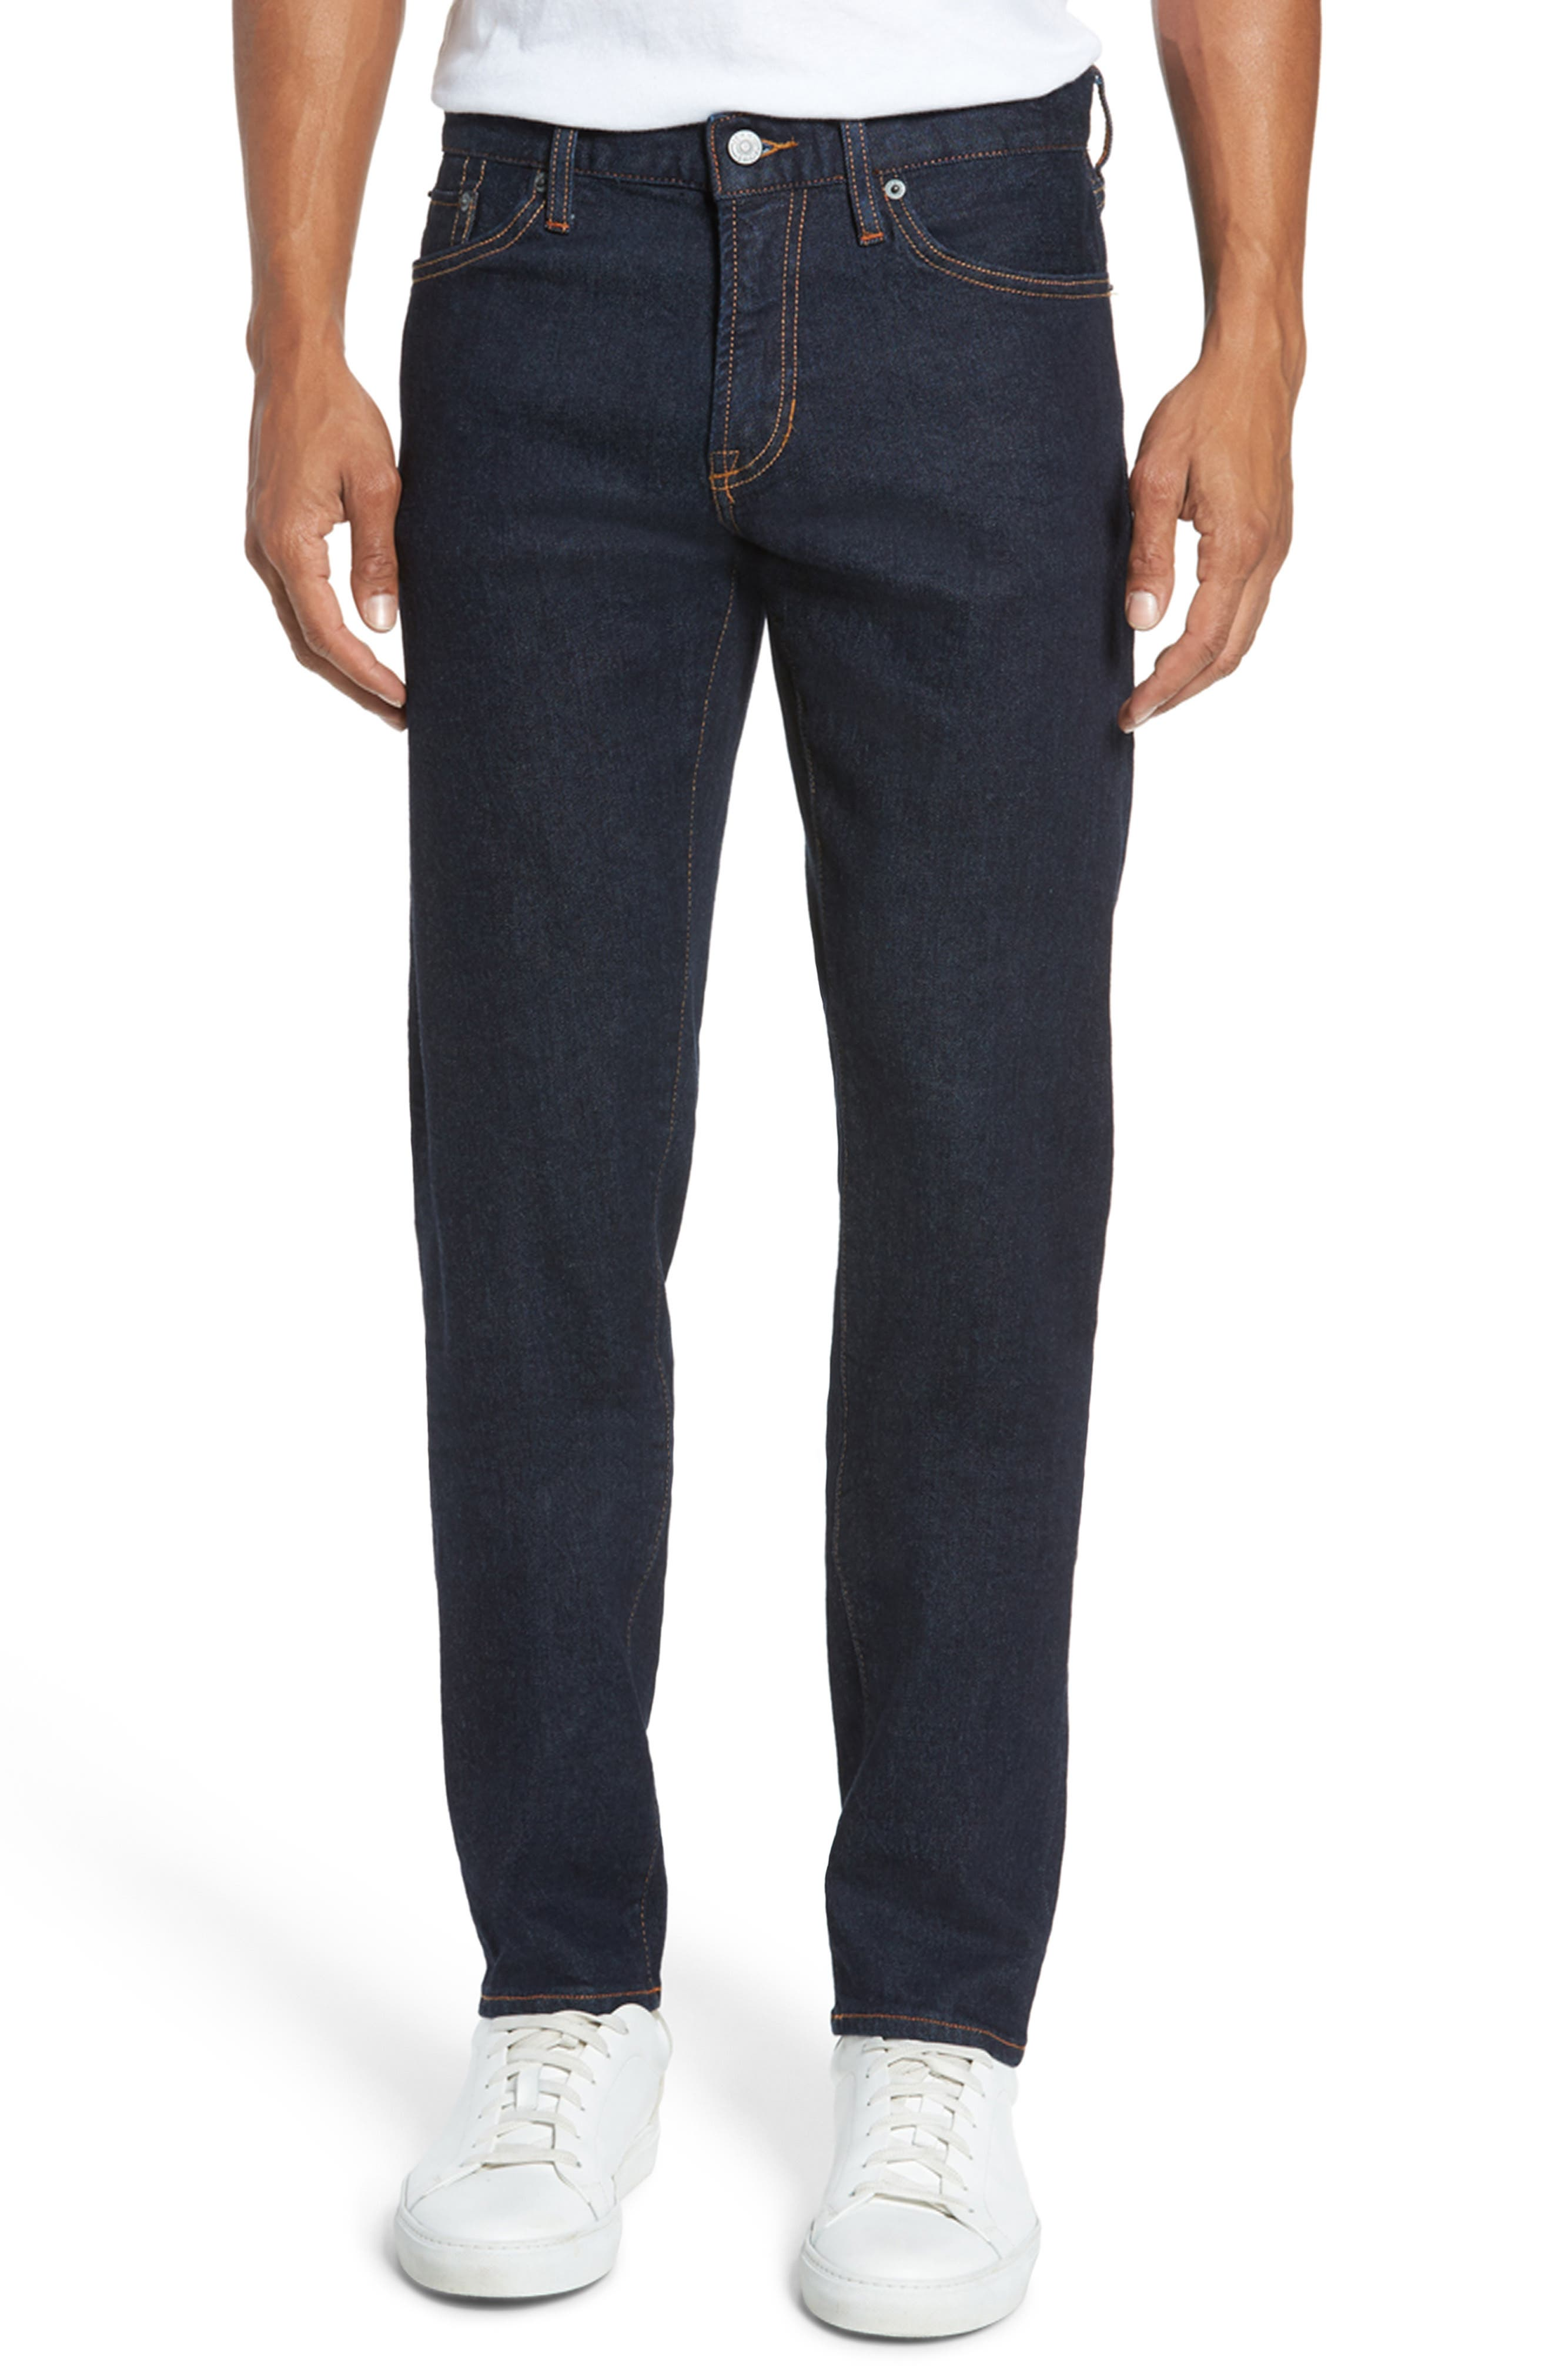 Jim Slim Fit Selvedge Jeans,                         Main,                         color, Stretch Rinse